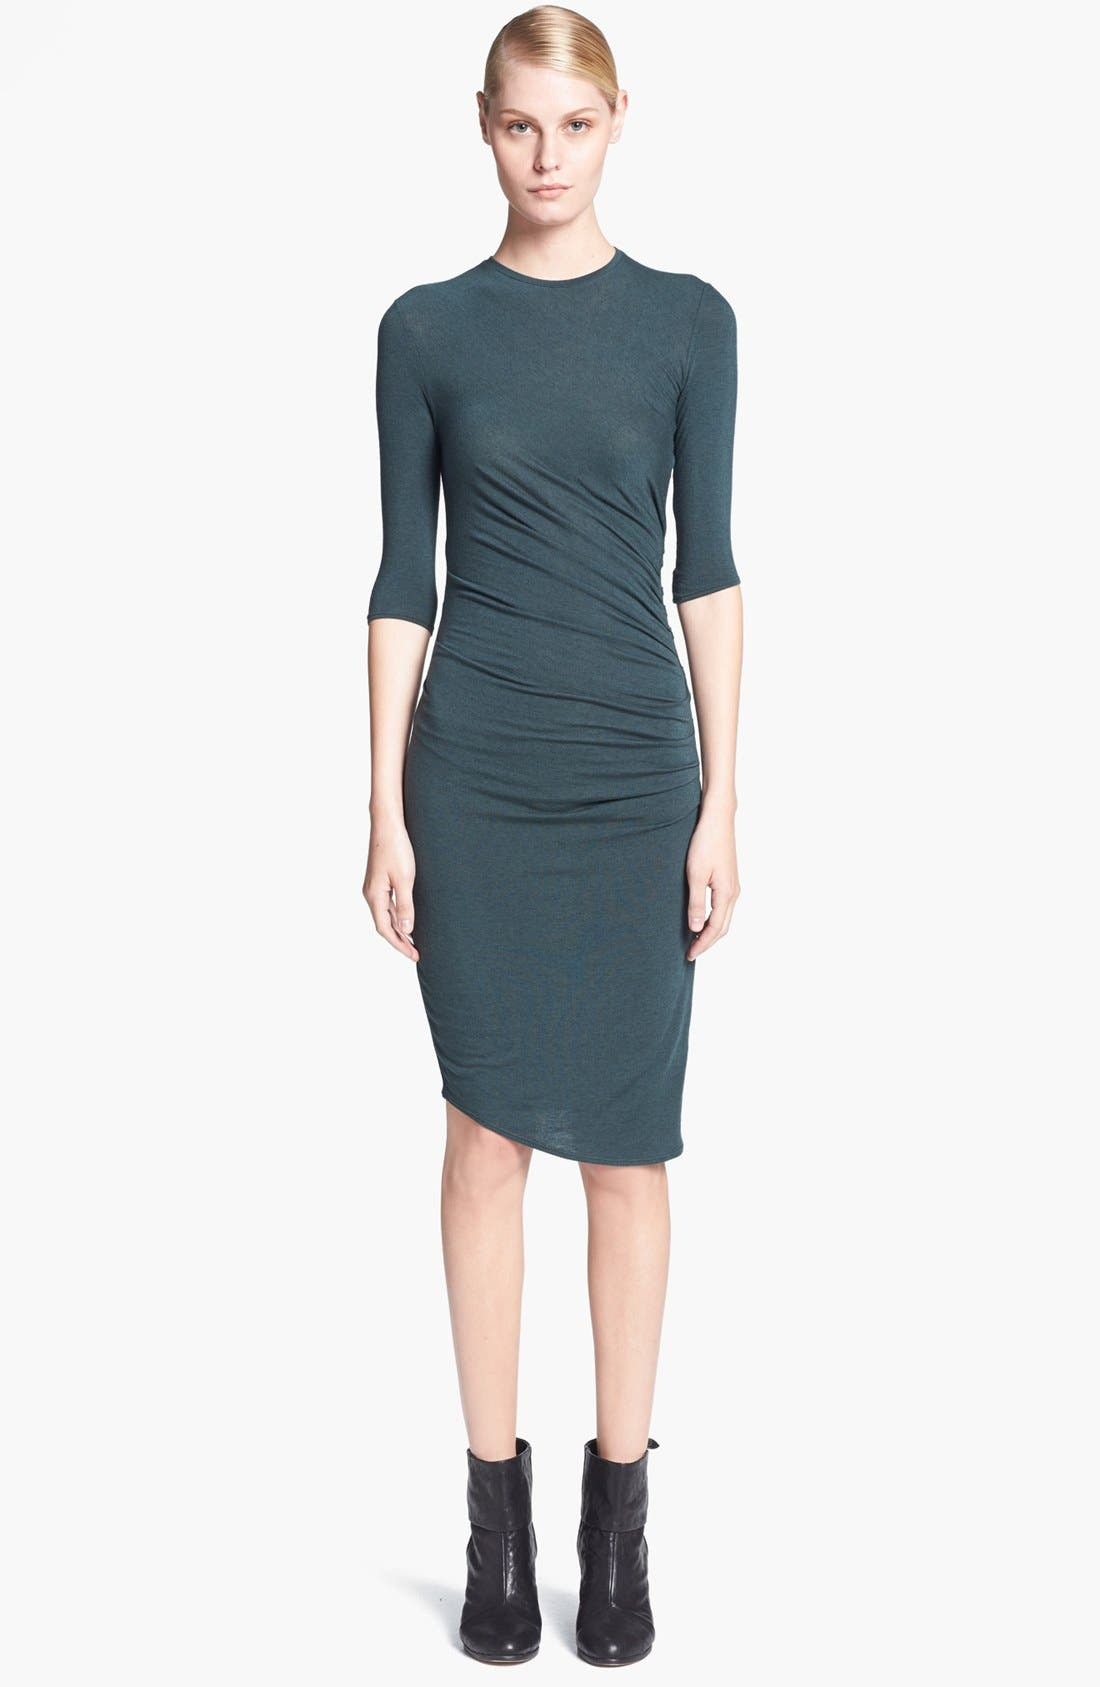 Alternate Image 1 Selected - HELMUT Helmut Lang 'Nova' Jersey Dress